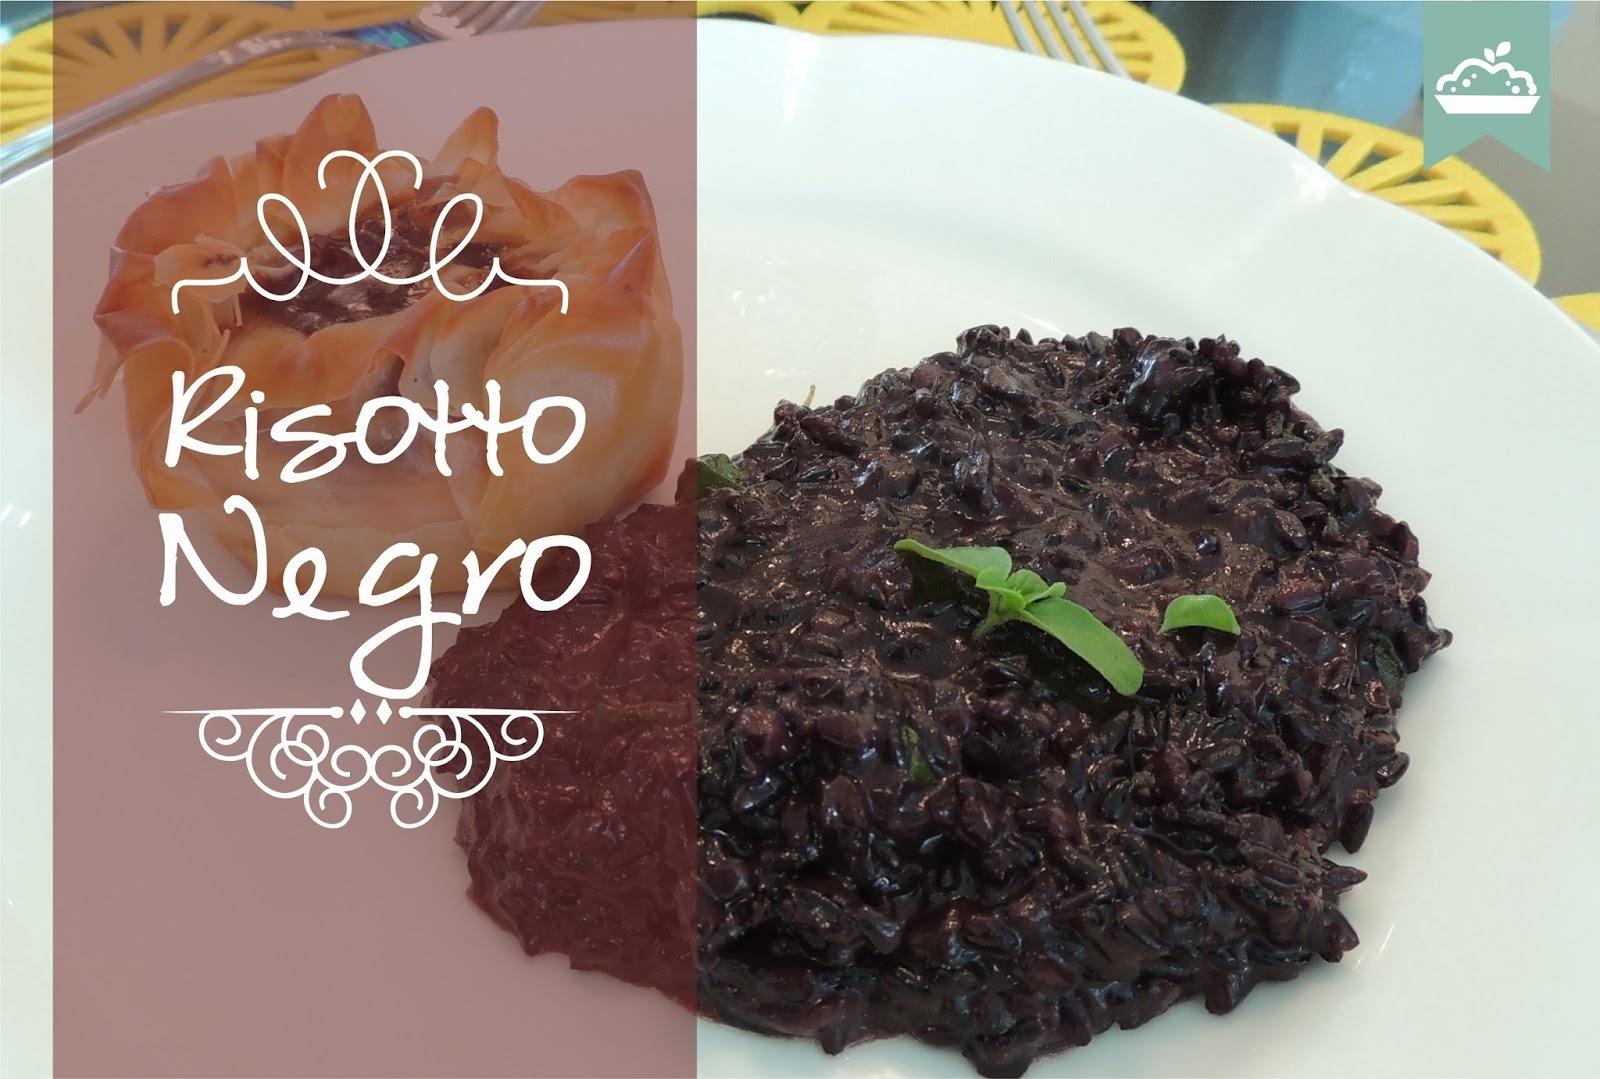 arroz negro tudo gostoso